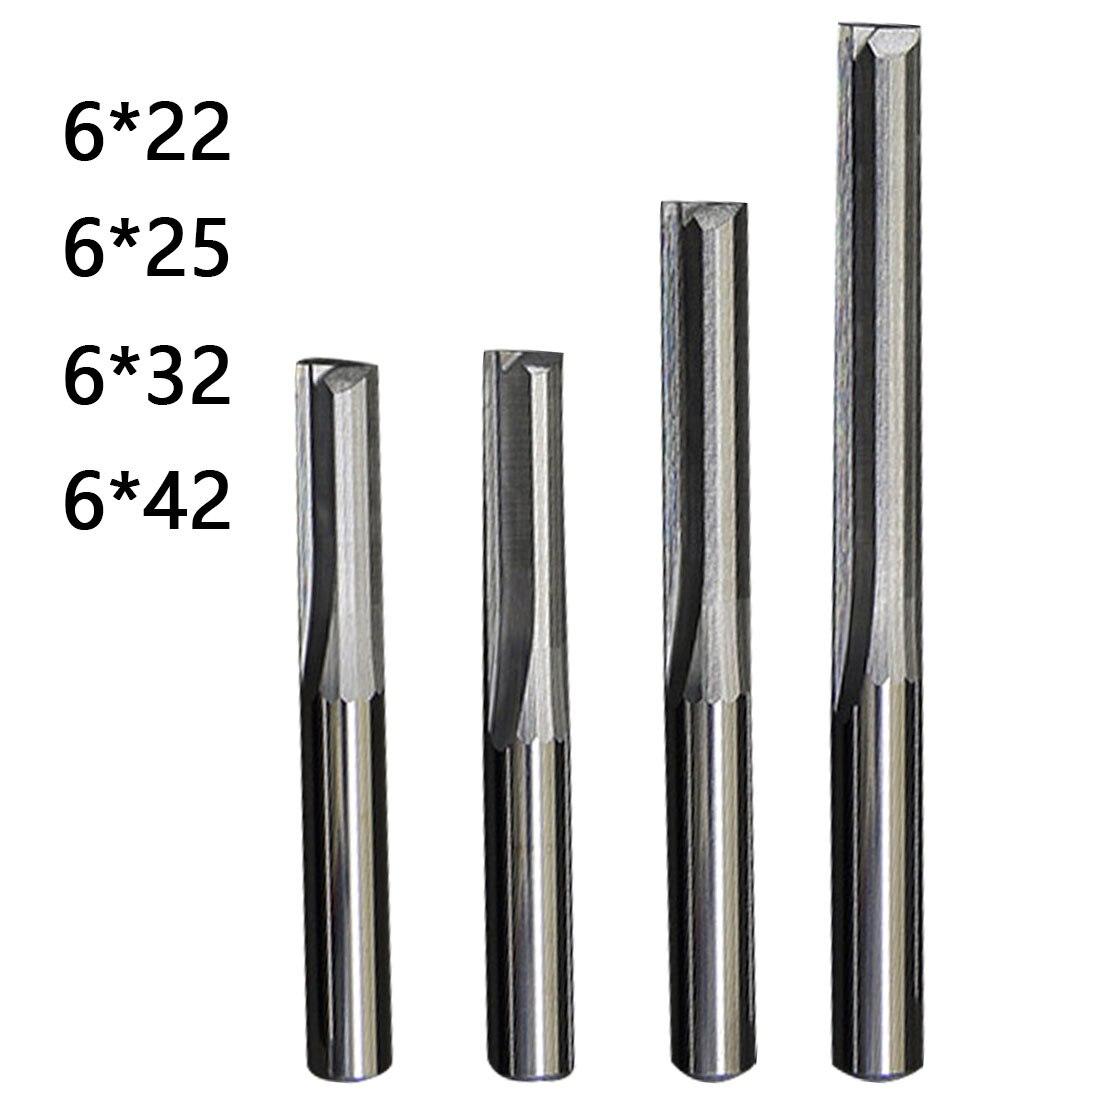 20.8mm Tungsten Carbide Tipped Straight Shank Reamer